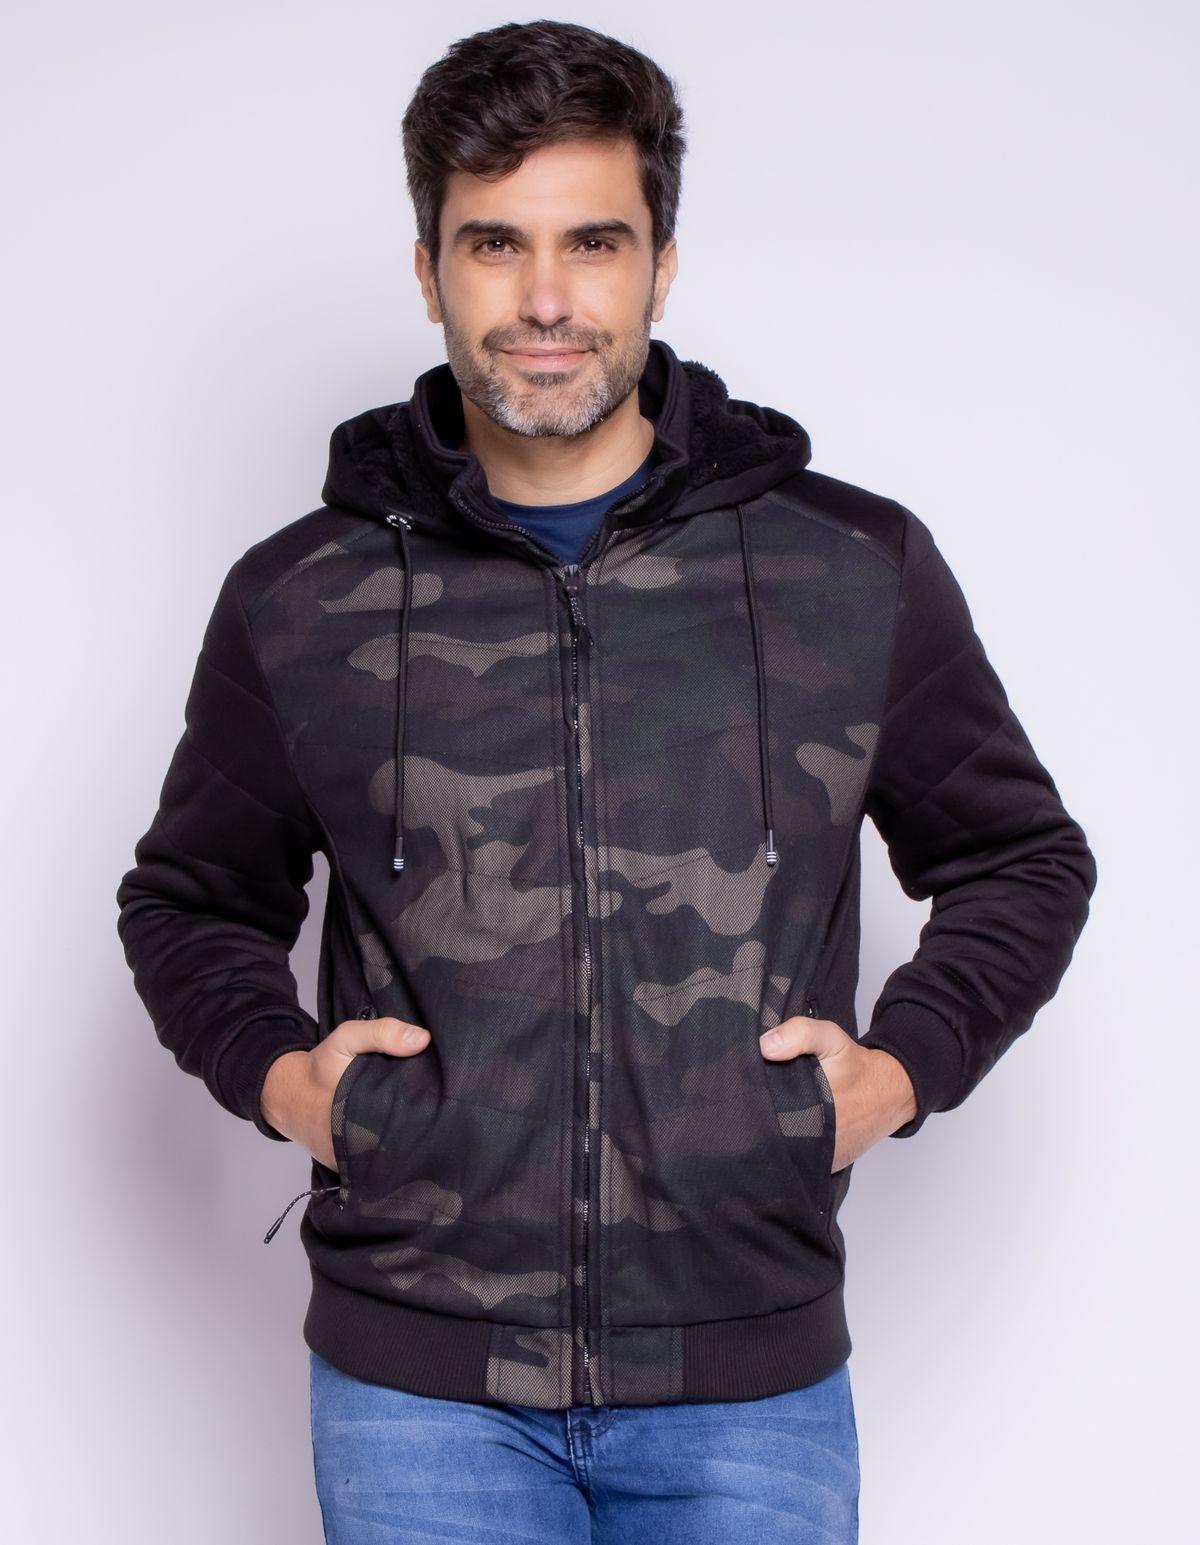 551961002-jaqueta-moletom-masculina-estampa-camuflada-militar-m-da8